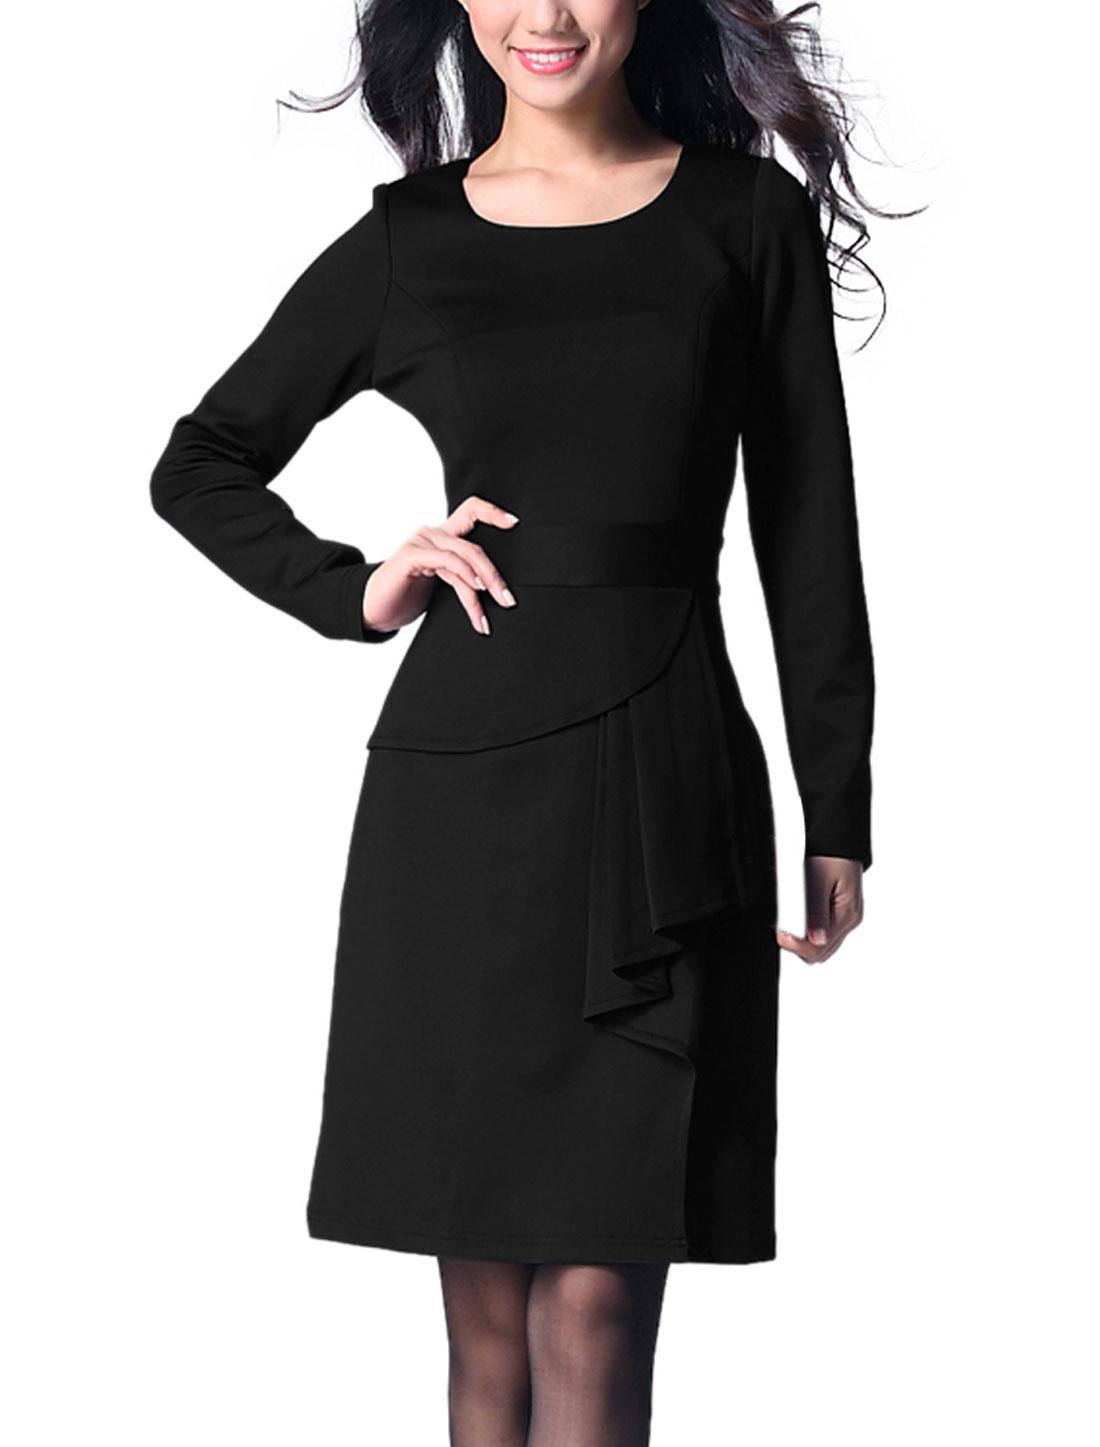 Ladies Black Scoop Neck Side Zipper Elegant Spring Dress XS